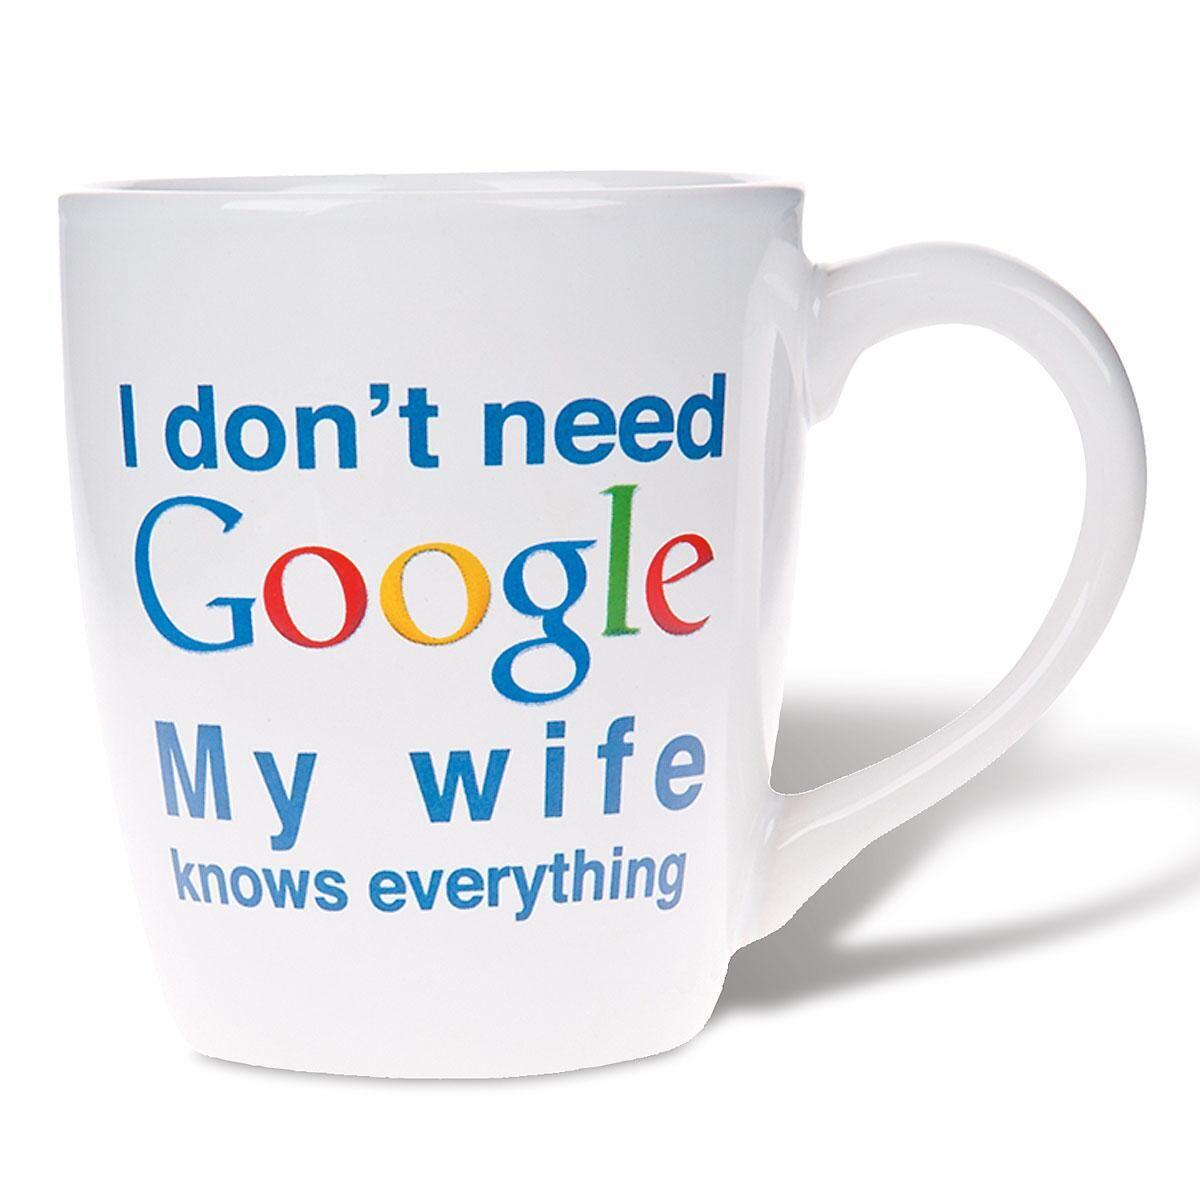 My Wife Knows Google Mug